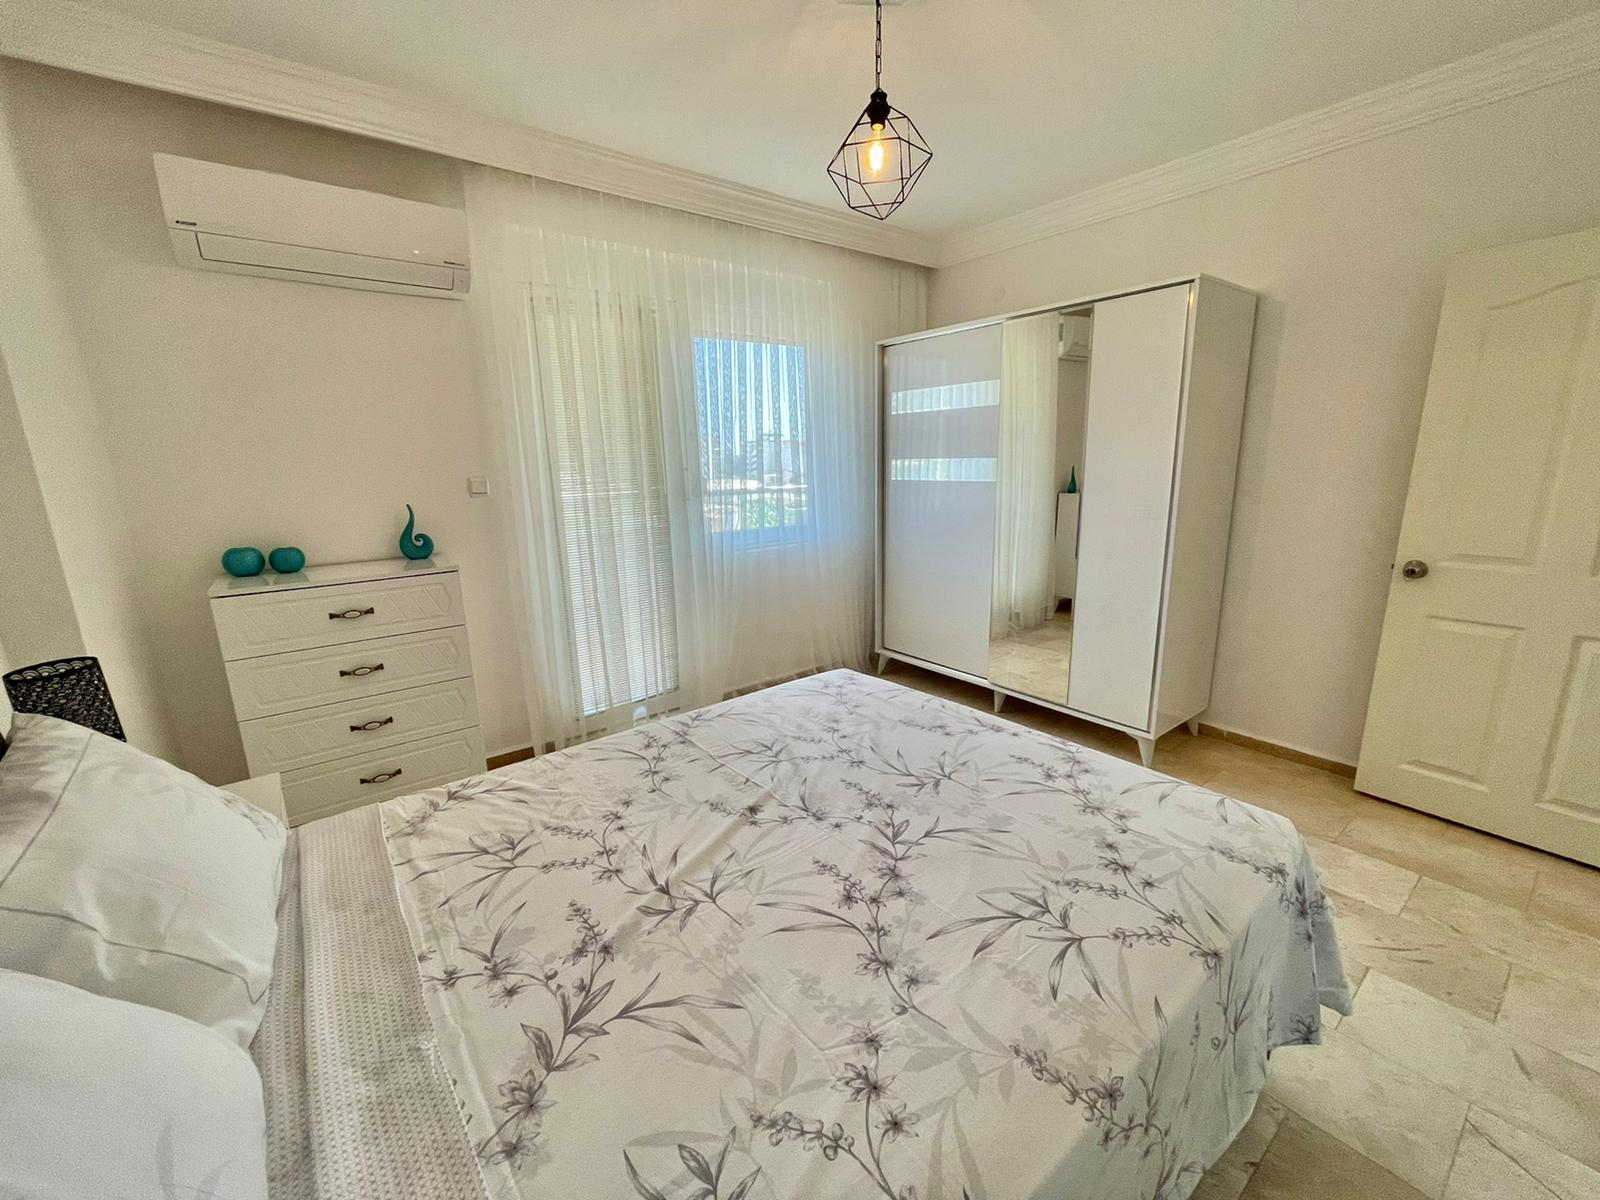 Трёхкомнатная квартира в «двух шагах» от Средиземного моря - Фото 18